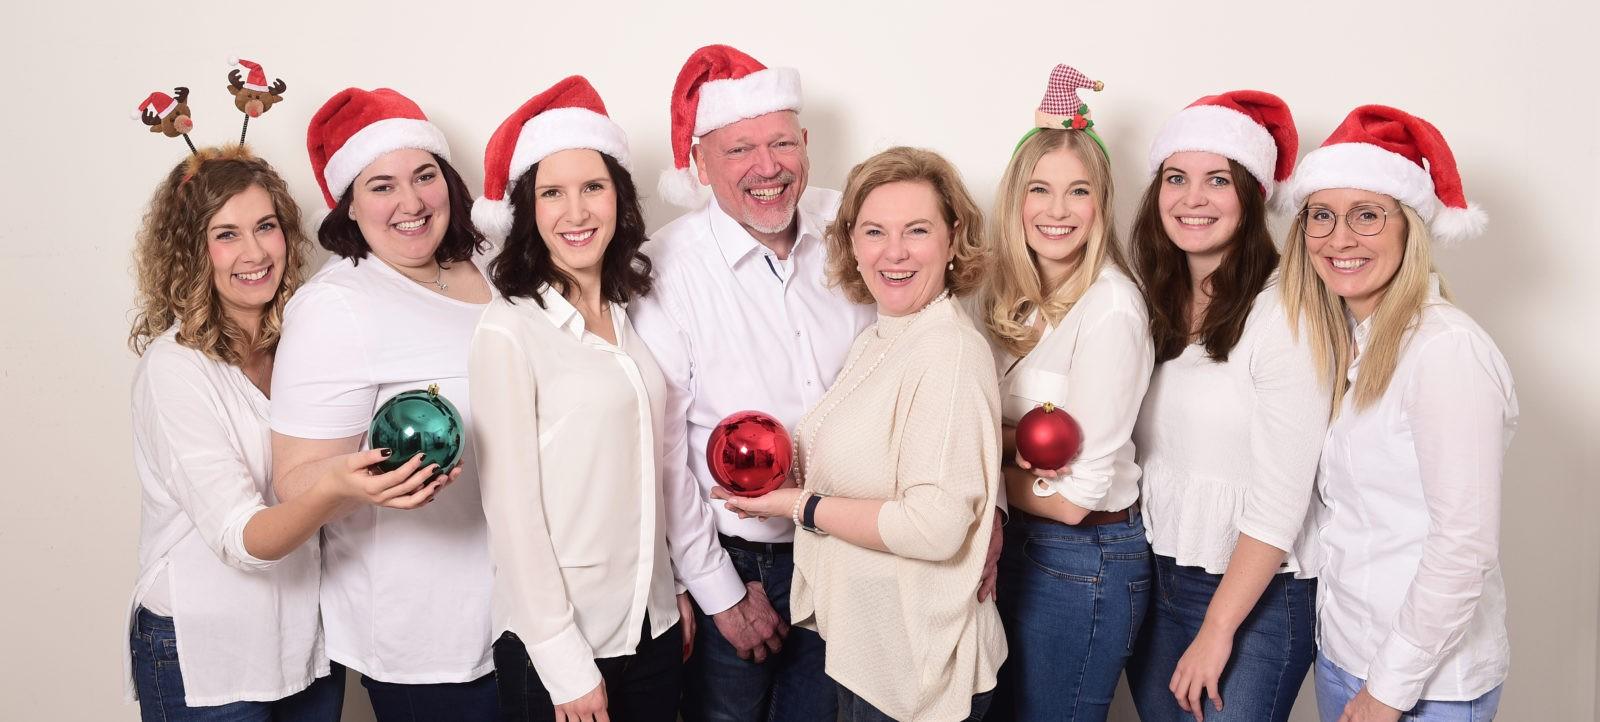 Theralingua wünscht fröhliche Weihnachten!